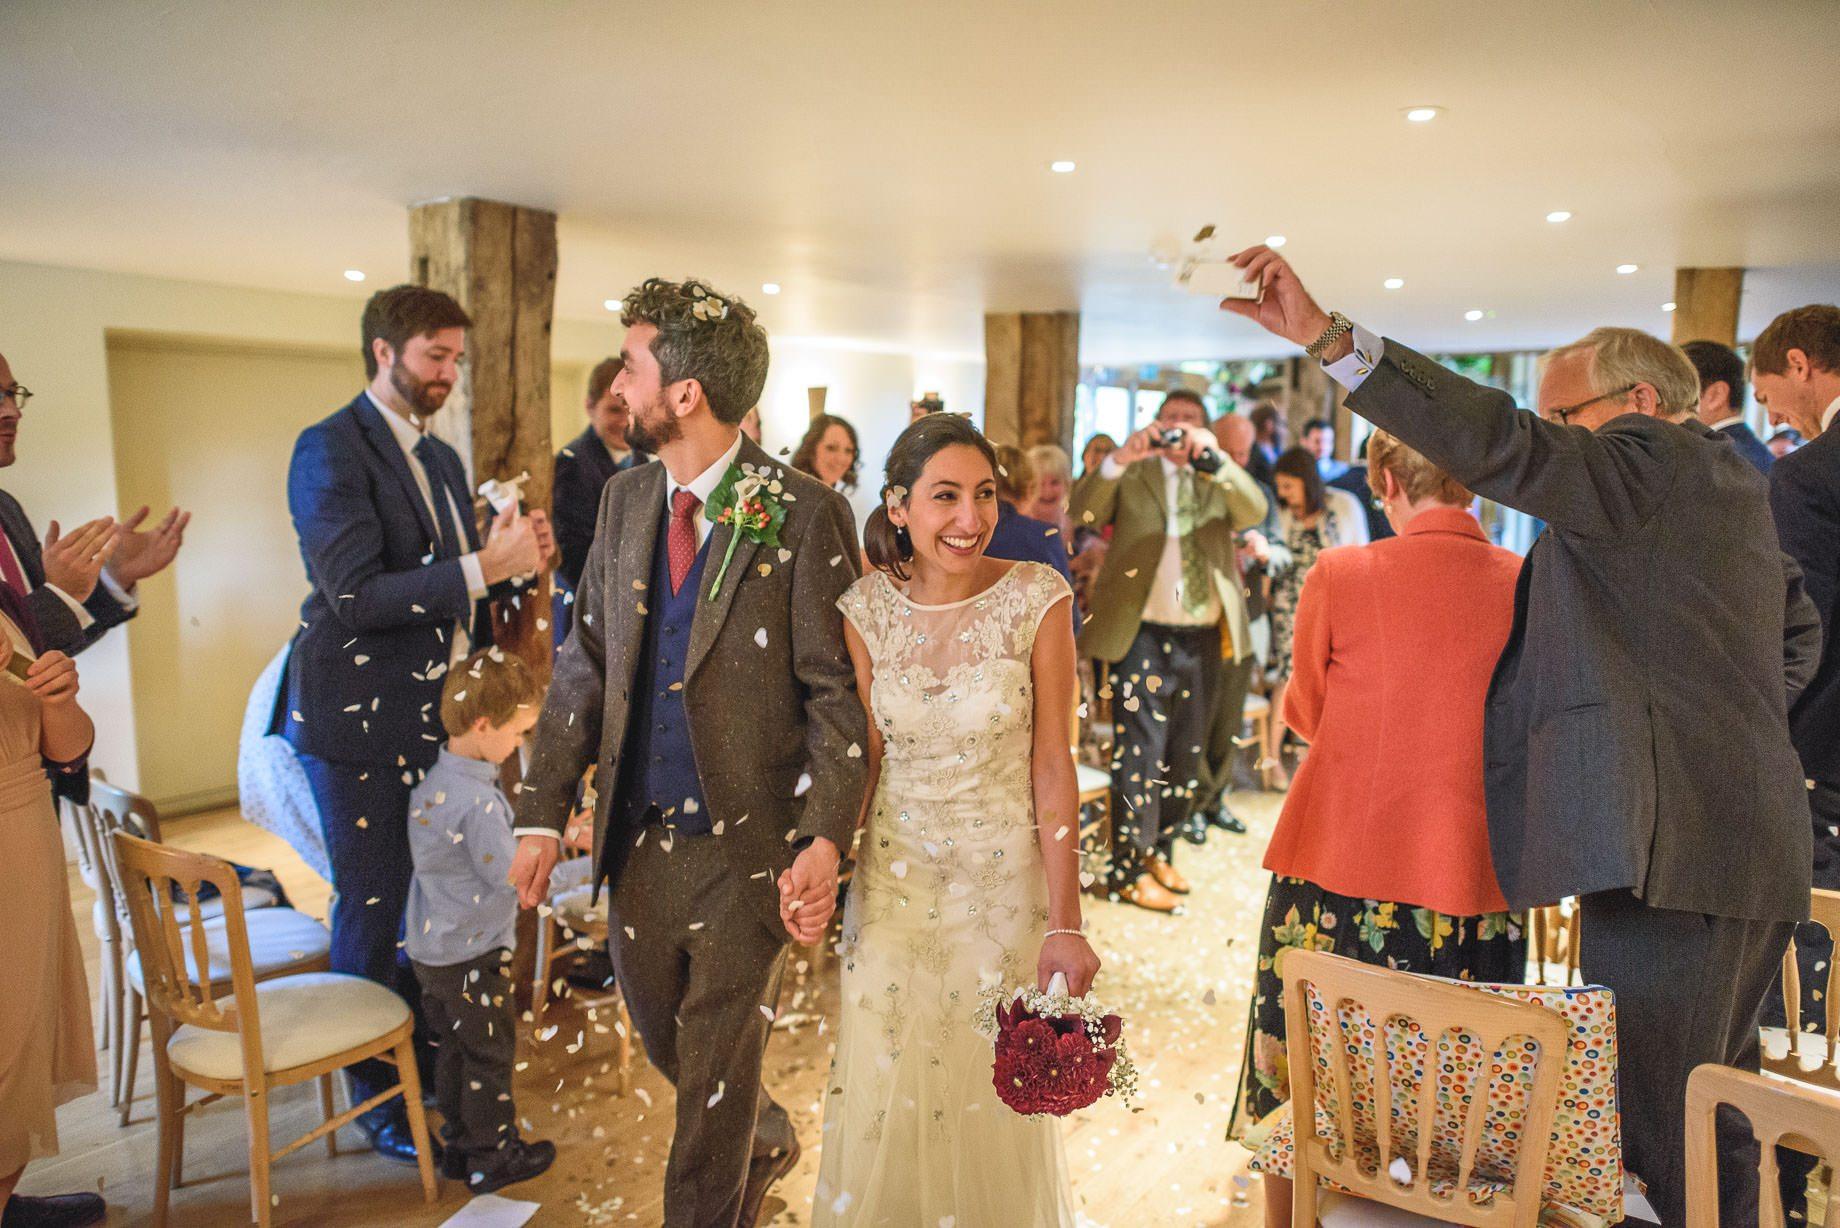 bury-court-barn-wedding-photography-guy-collier-photography-nadia-tom-67-of-184